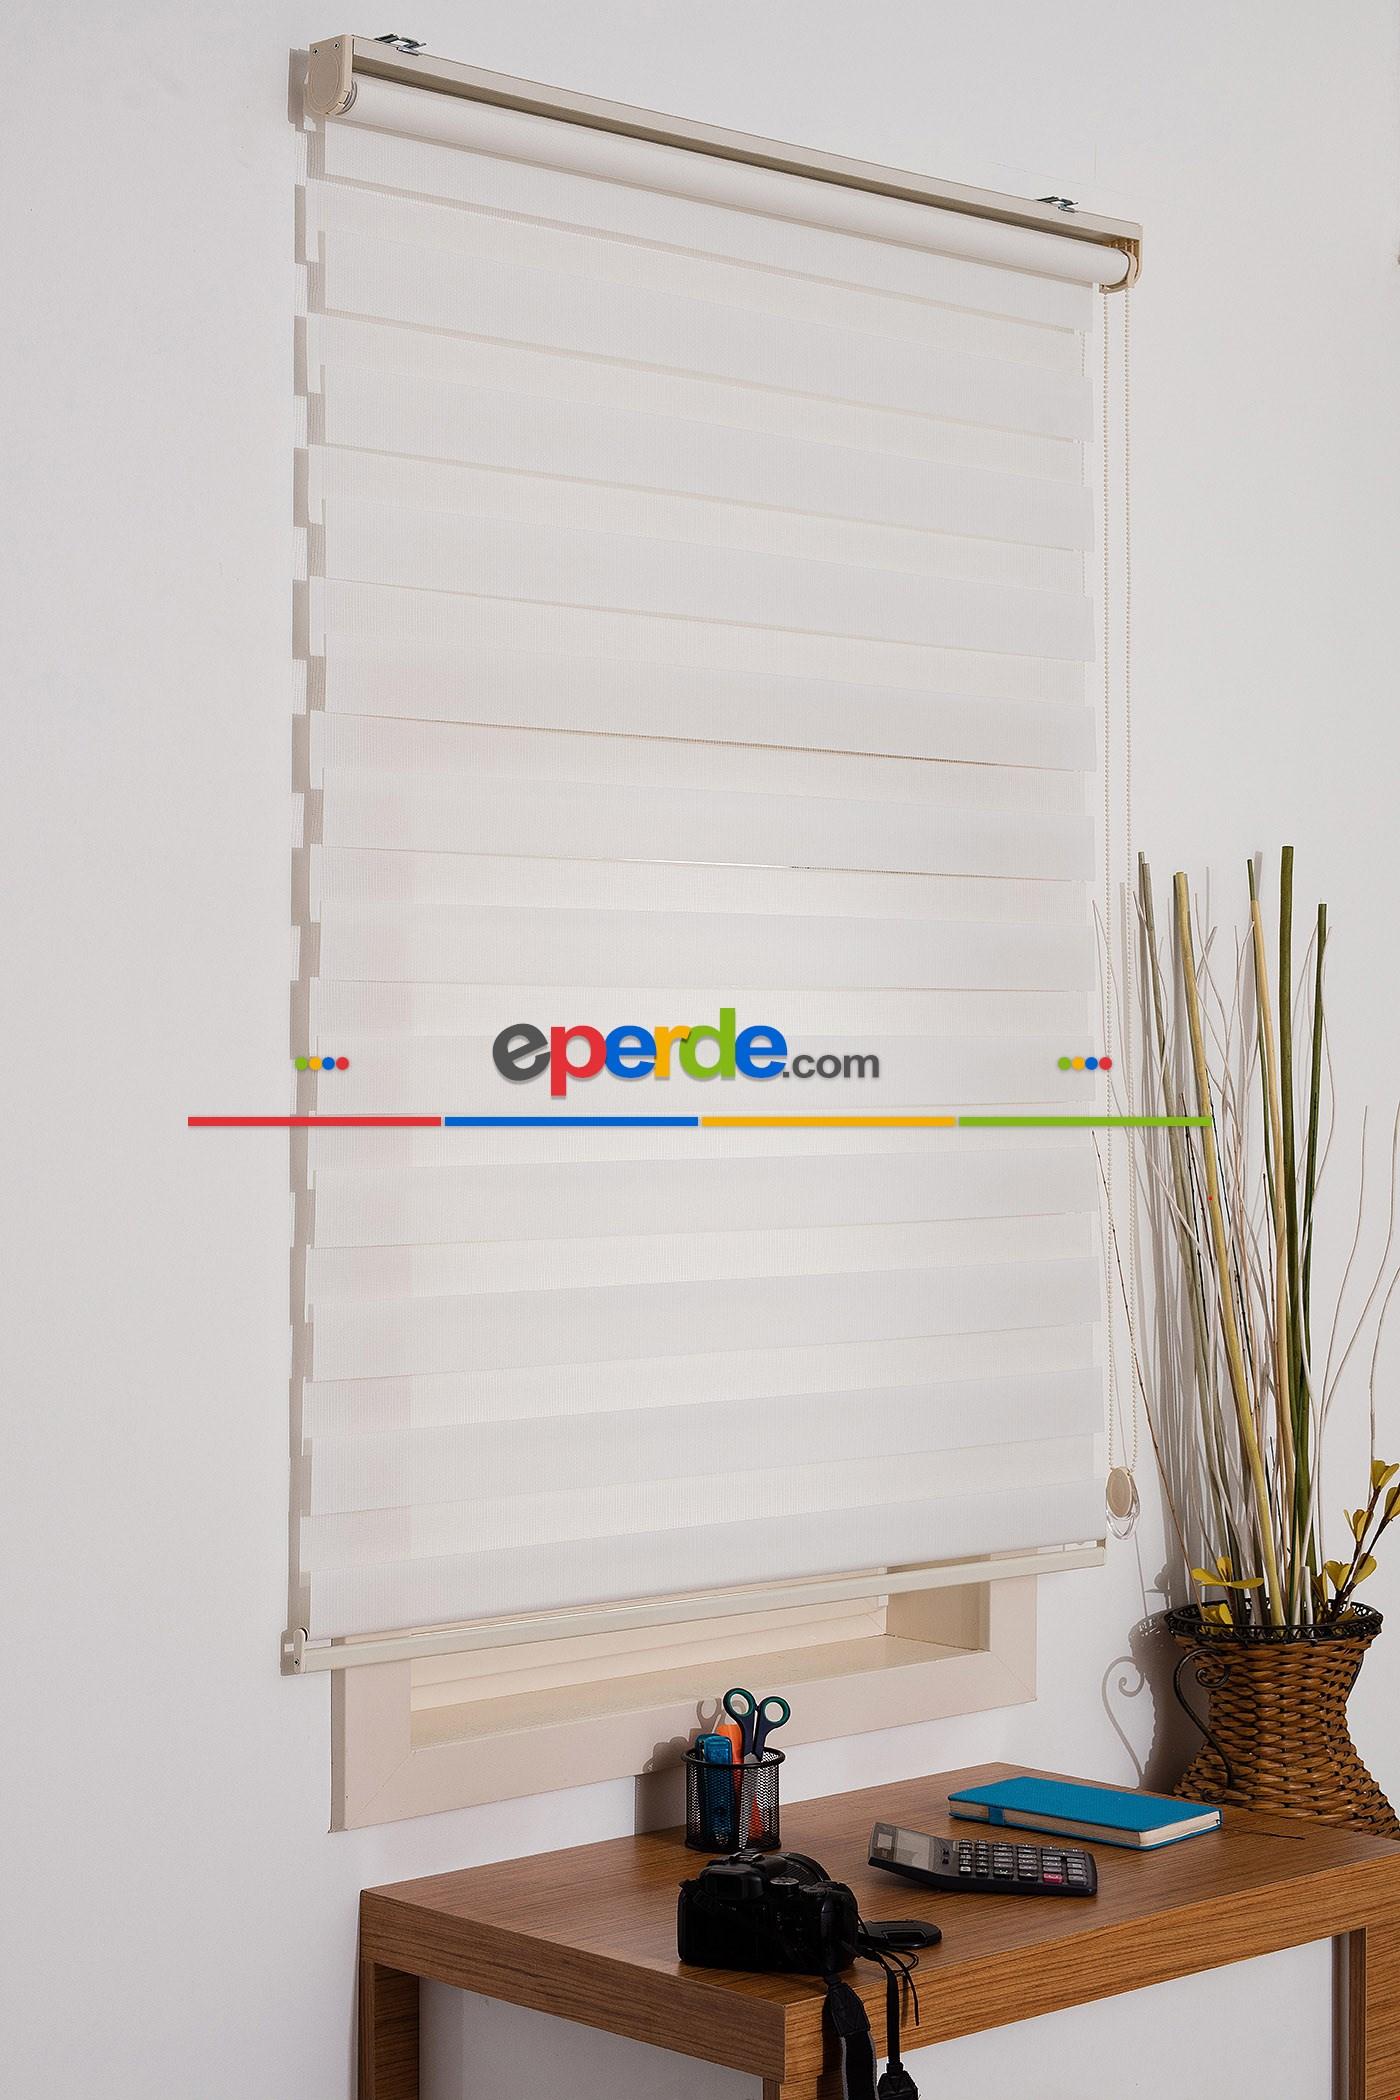 Fırsat!!! Kalın Bambu Lüx Ekru Zebra Perde ( Ücretsiz Etek Dilim )